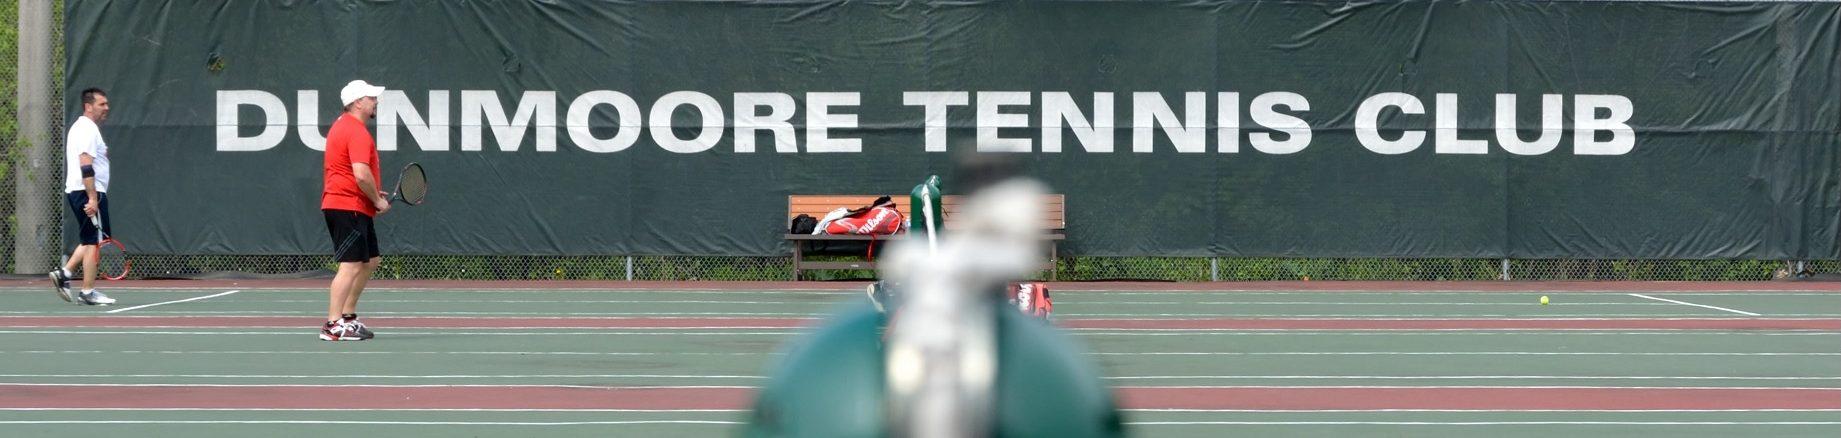 Dunmoore Tennis Club